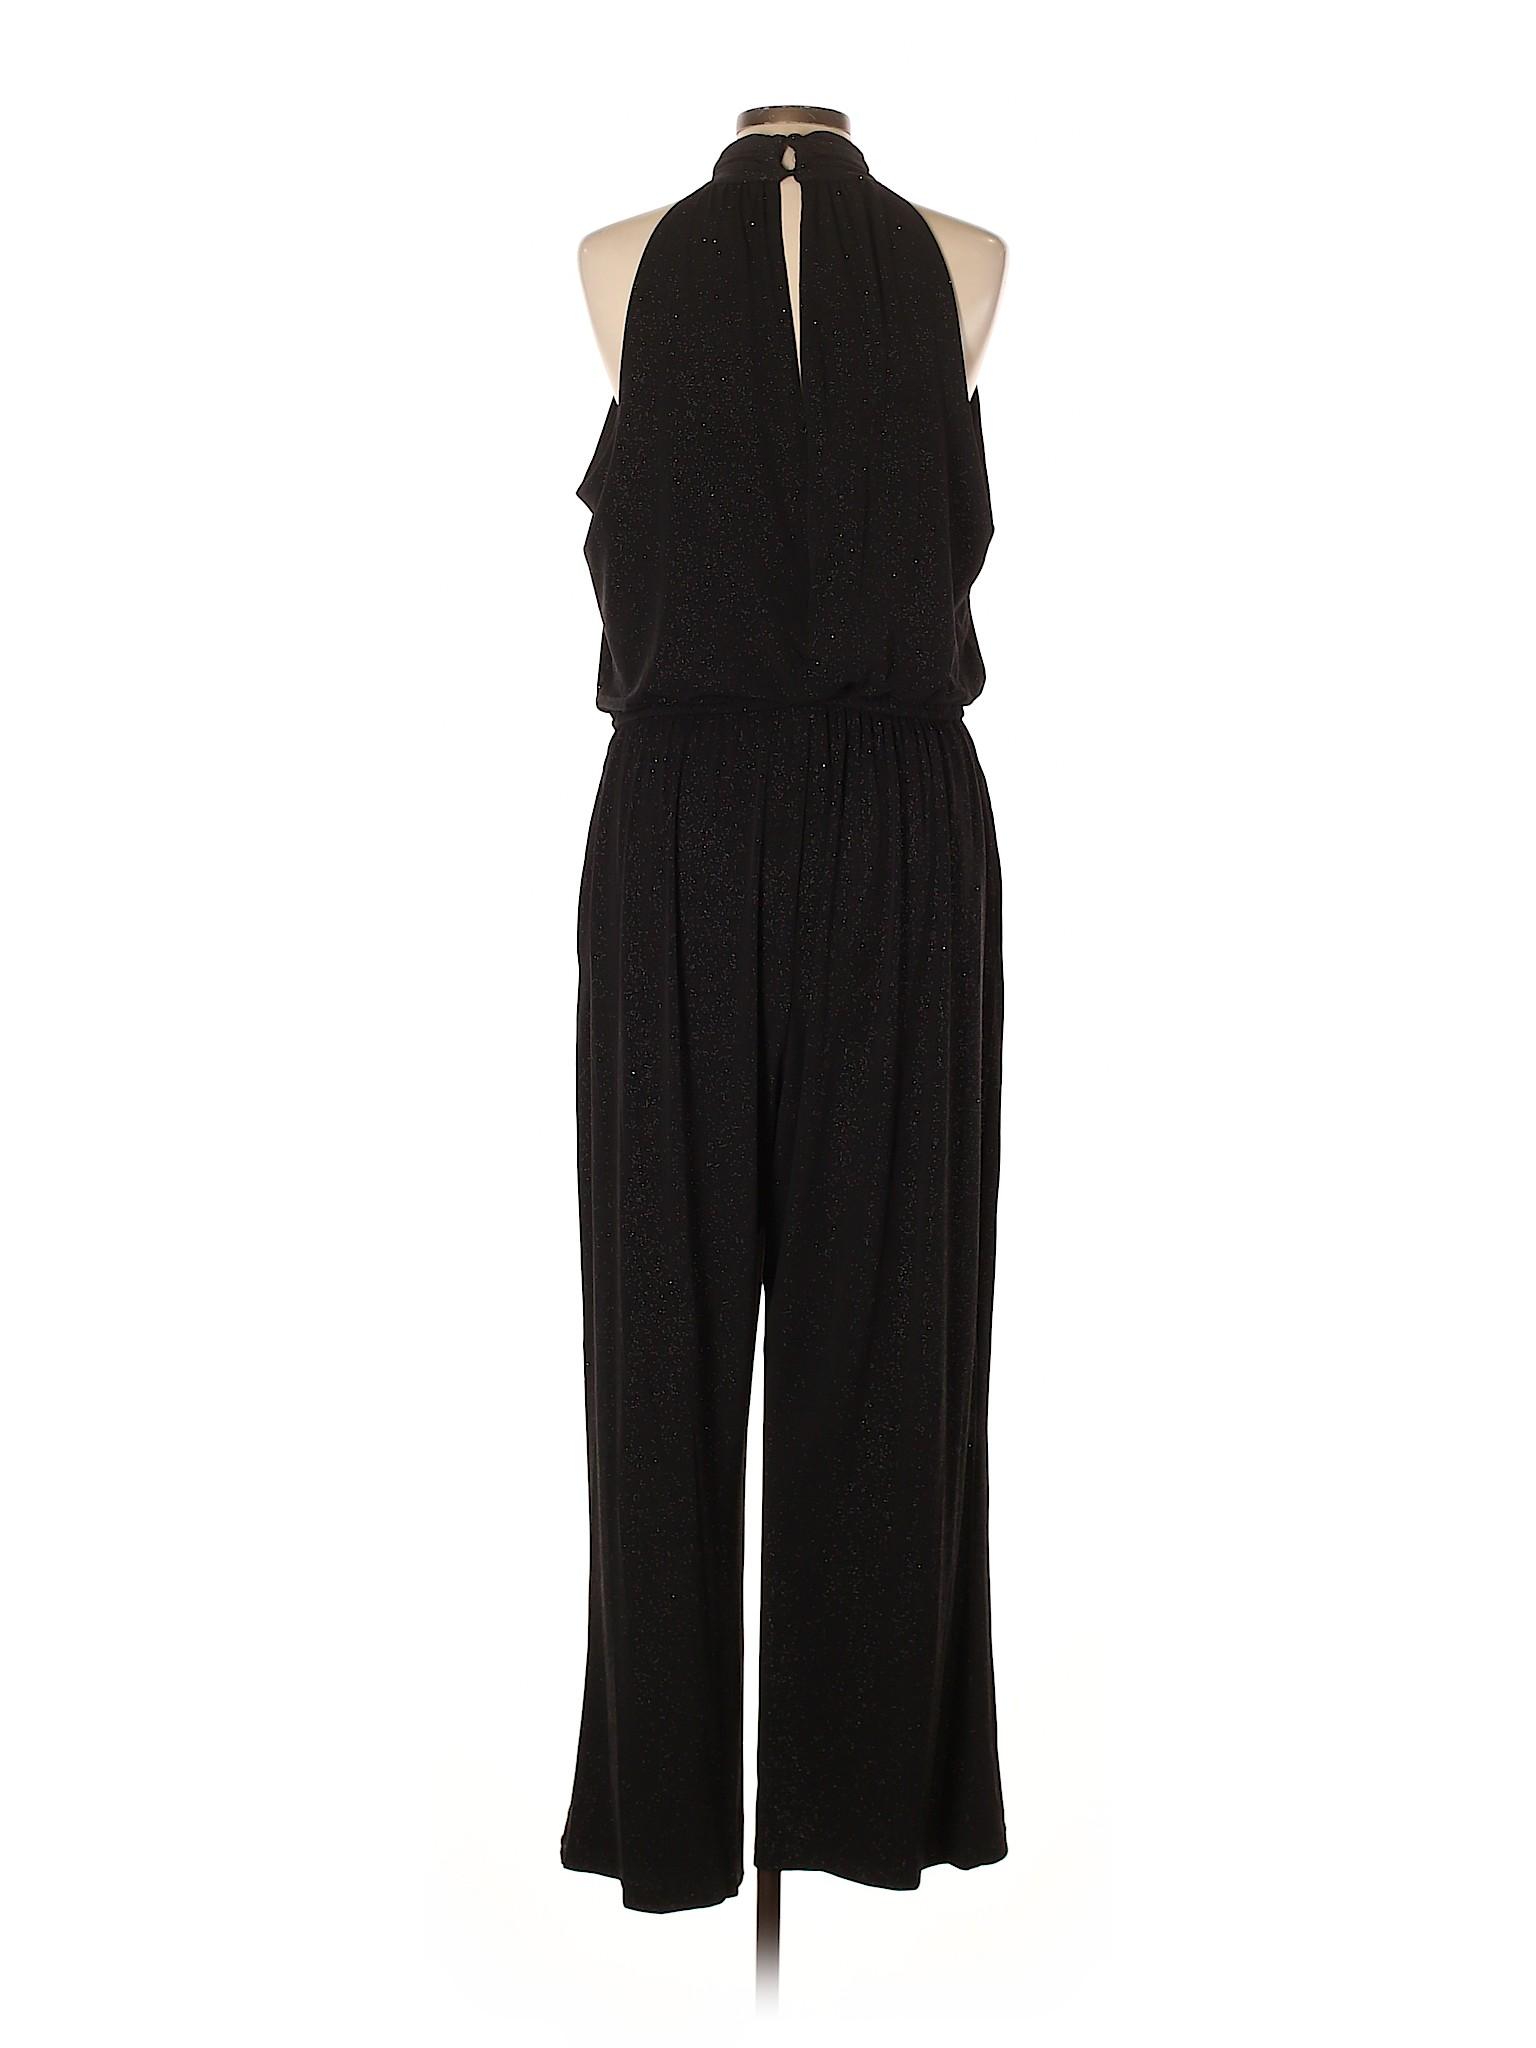 f7e3b0f7eba Enfocus Metallic Black Jumpsuit Size 16 - 37% off